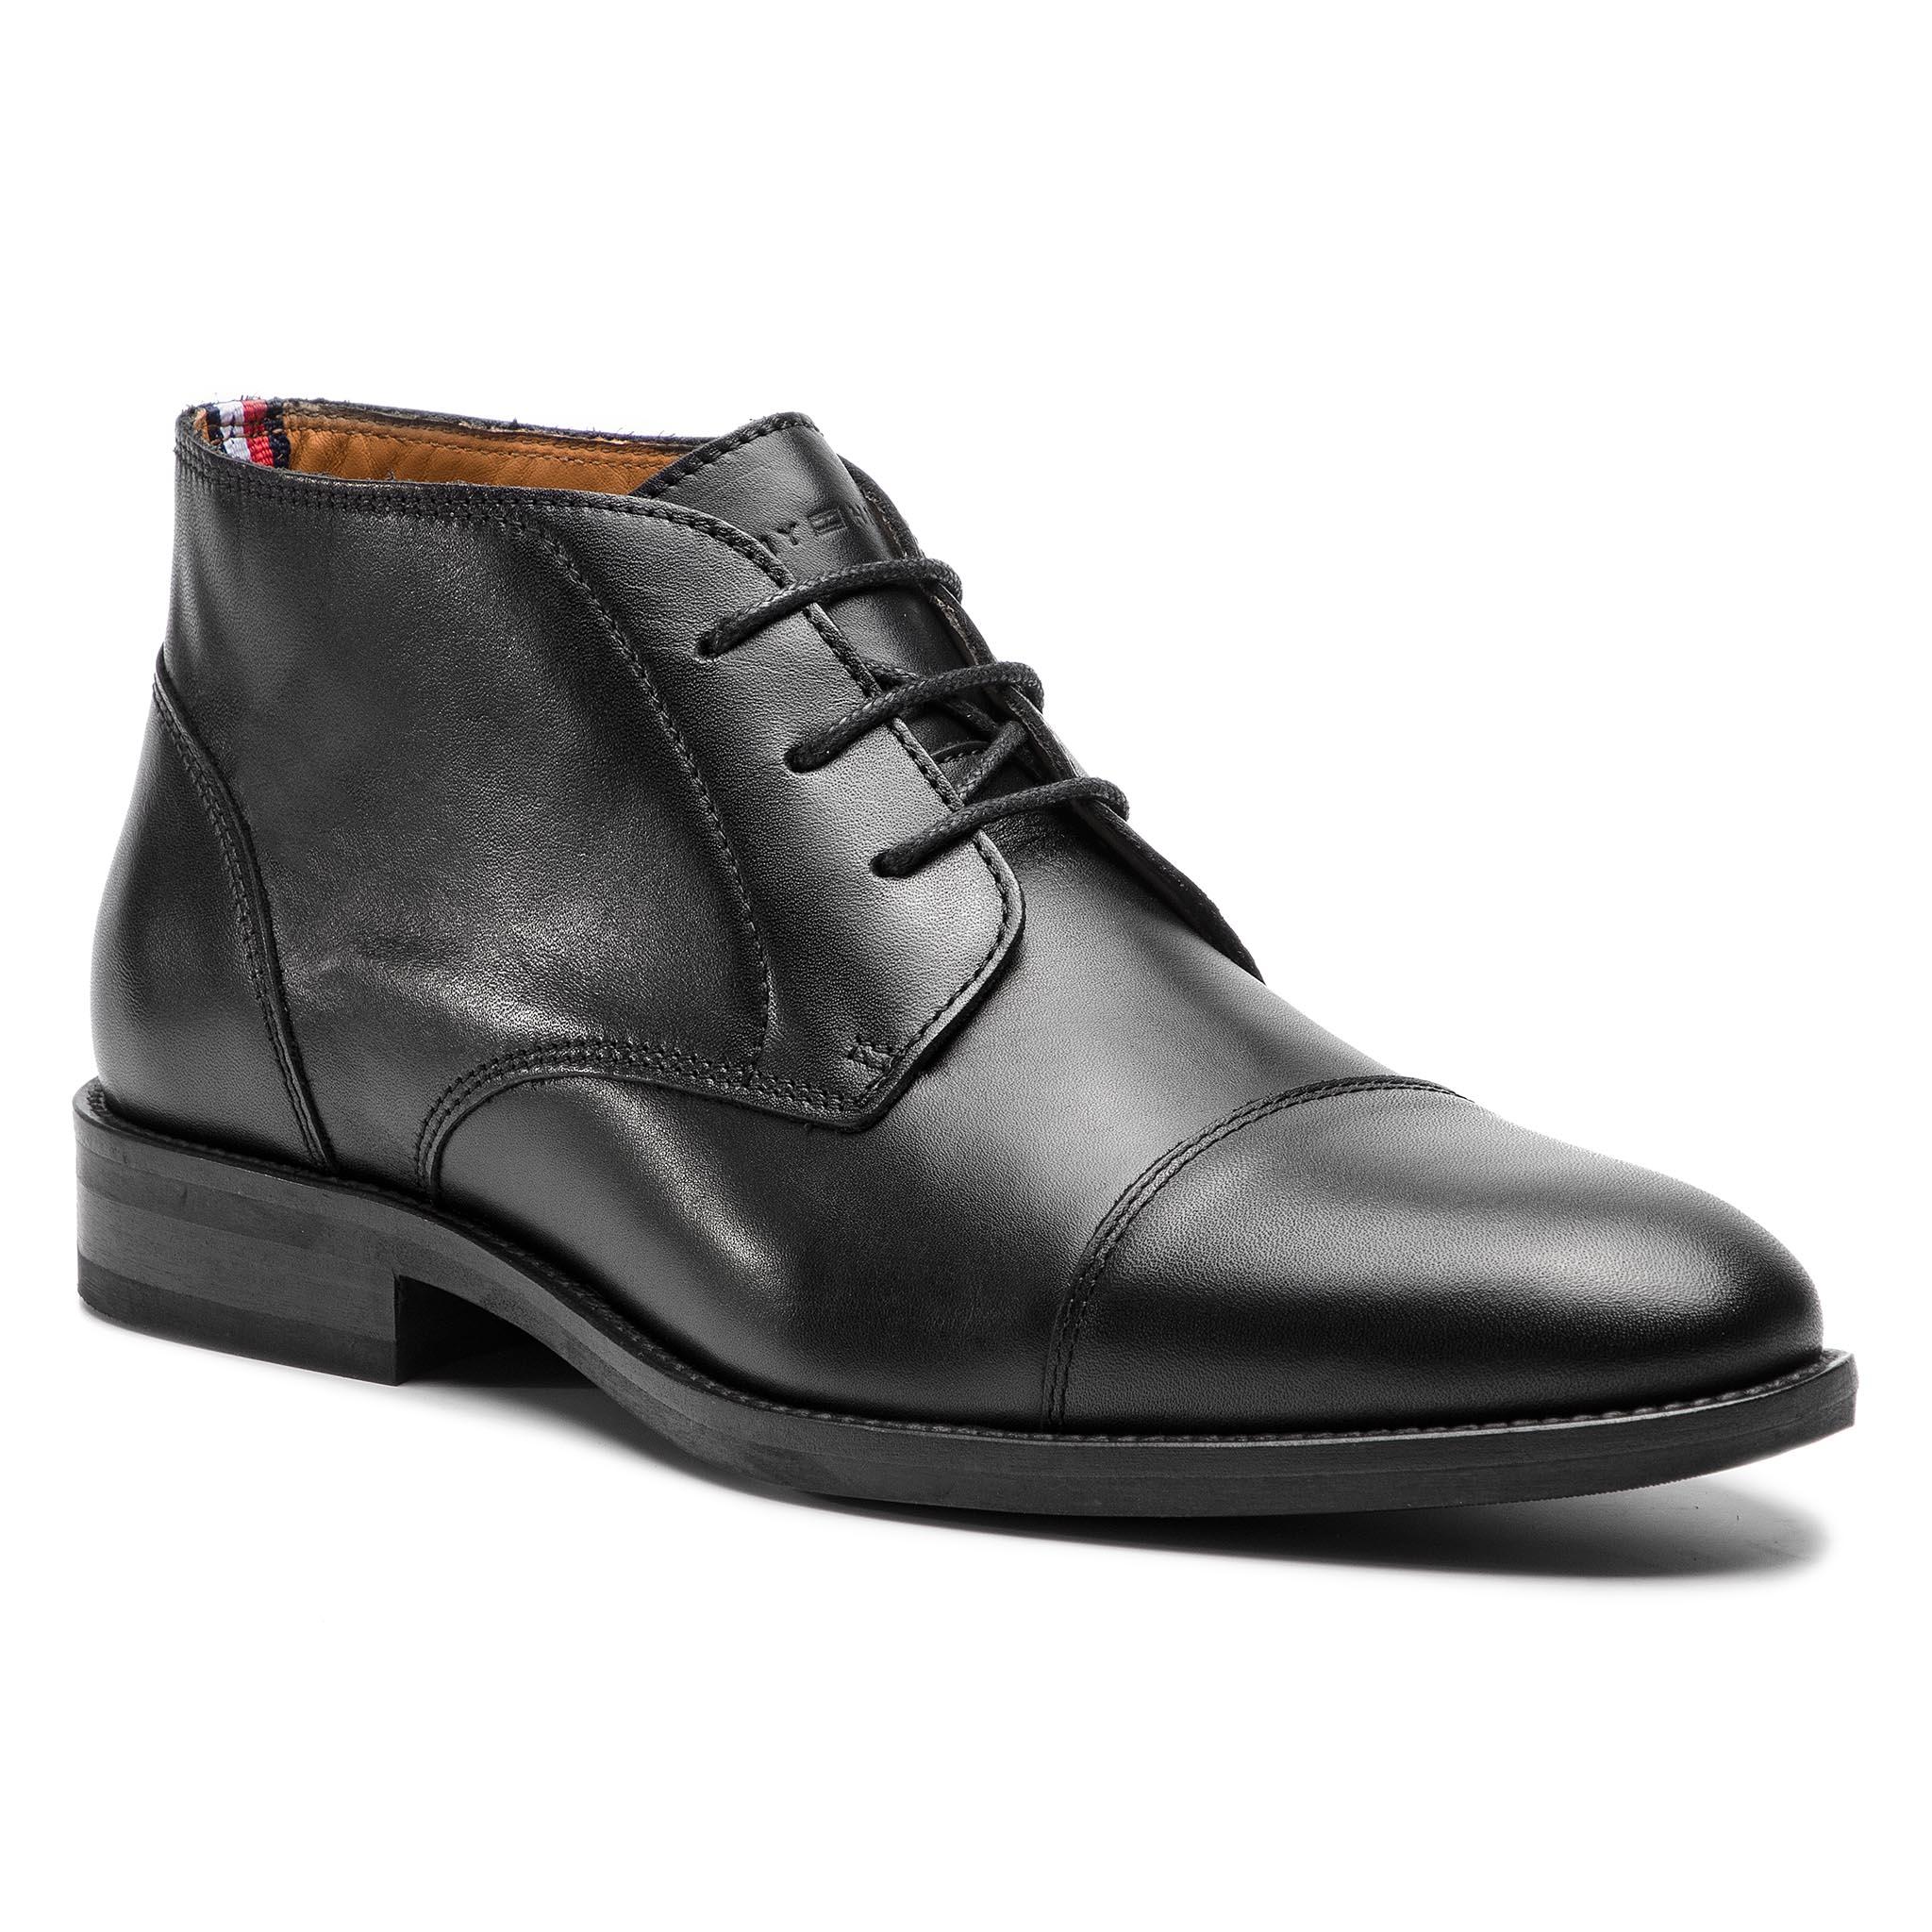 0a4e8cc319 ... TOMMY HILFIGER - Essential Leather Toecap Boot FM0FM02138 Black 990.  -20%. Bokacipő ...